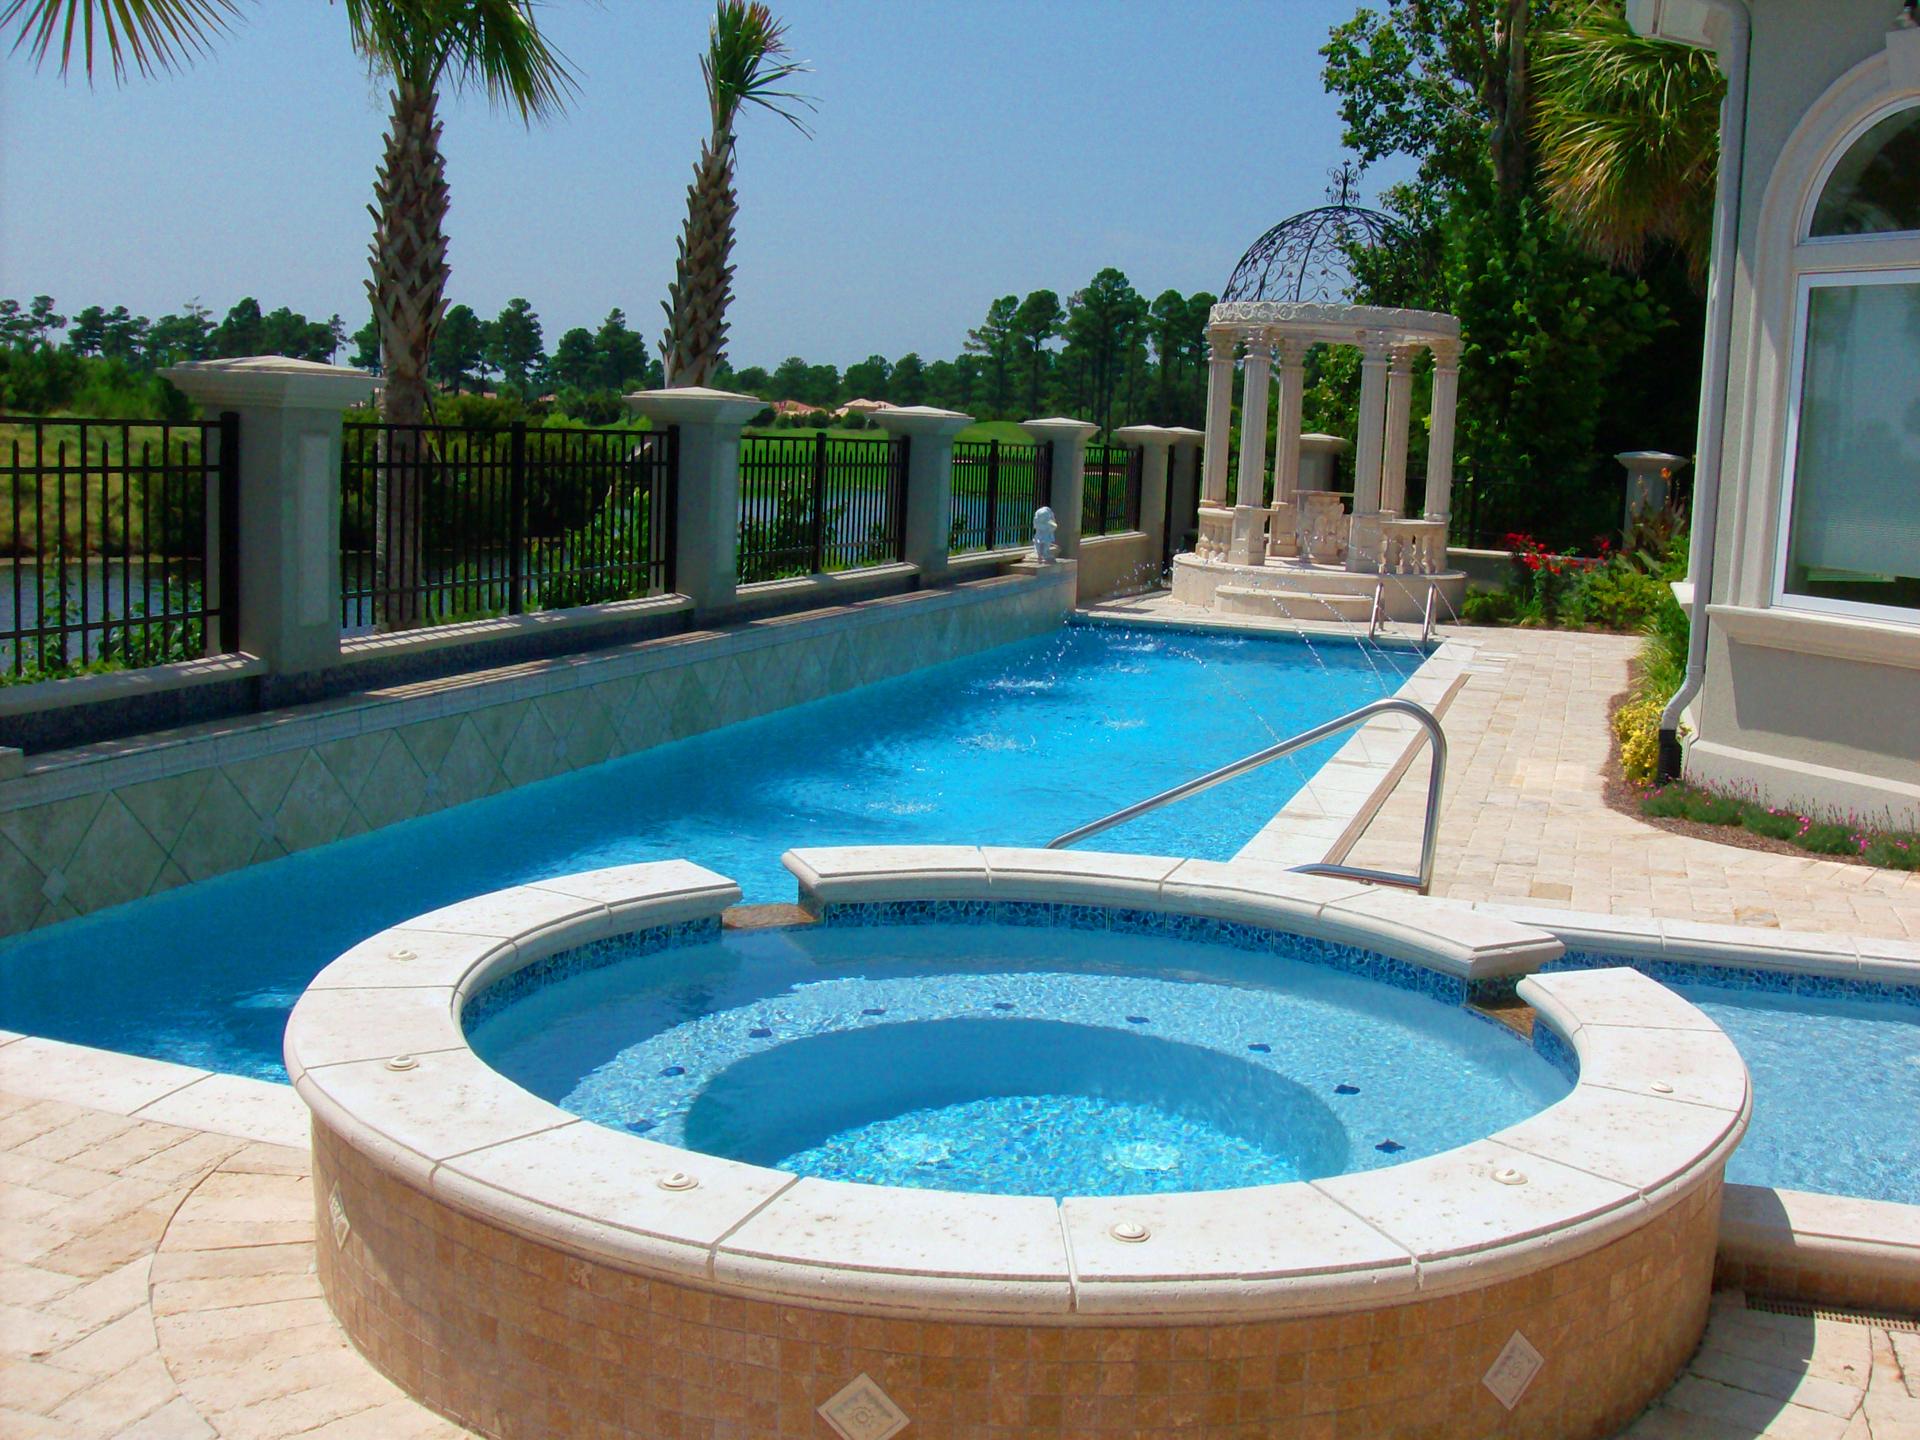 Our Swimming Pool Designs Myrtle Beach Pools Acm Pools